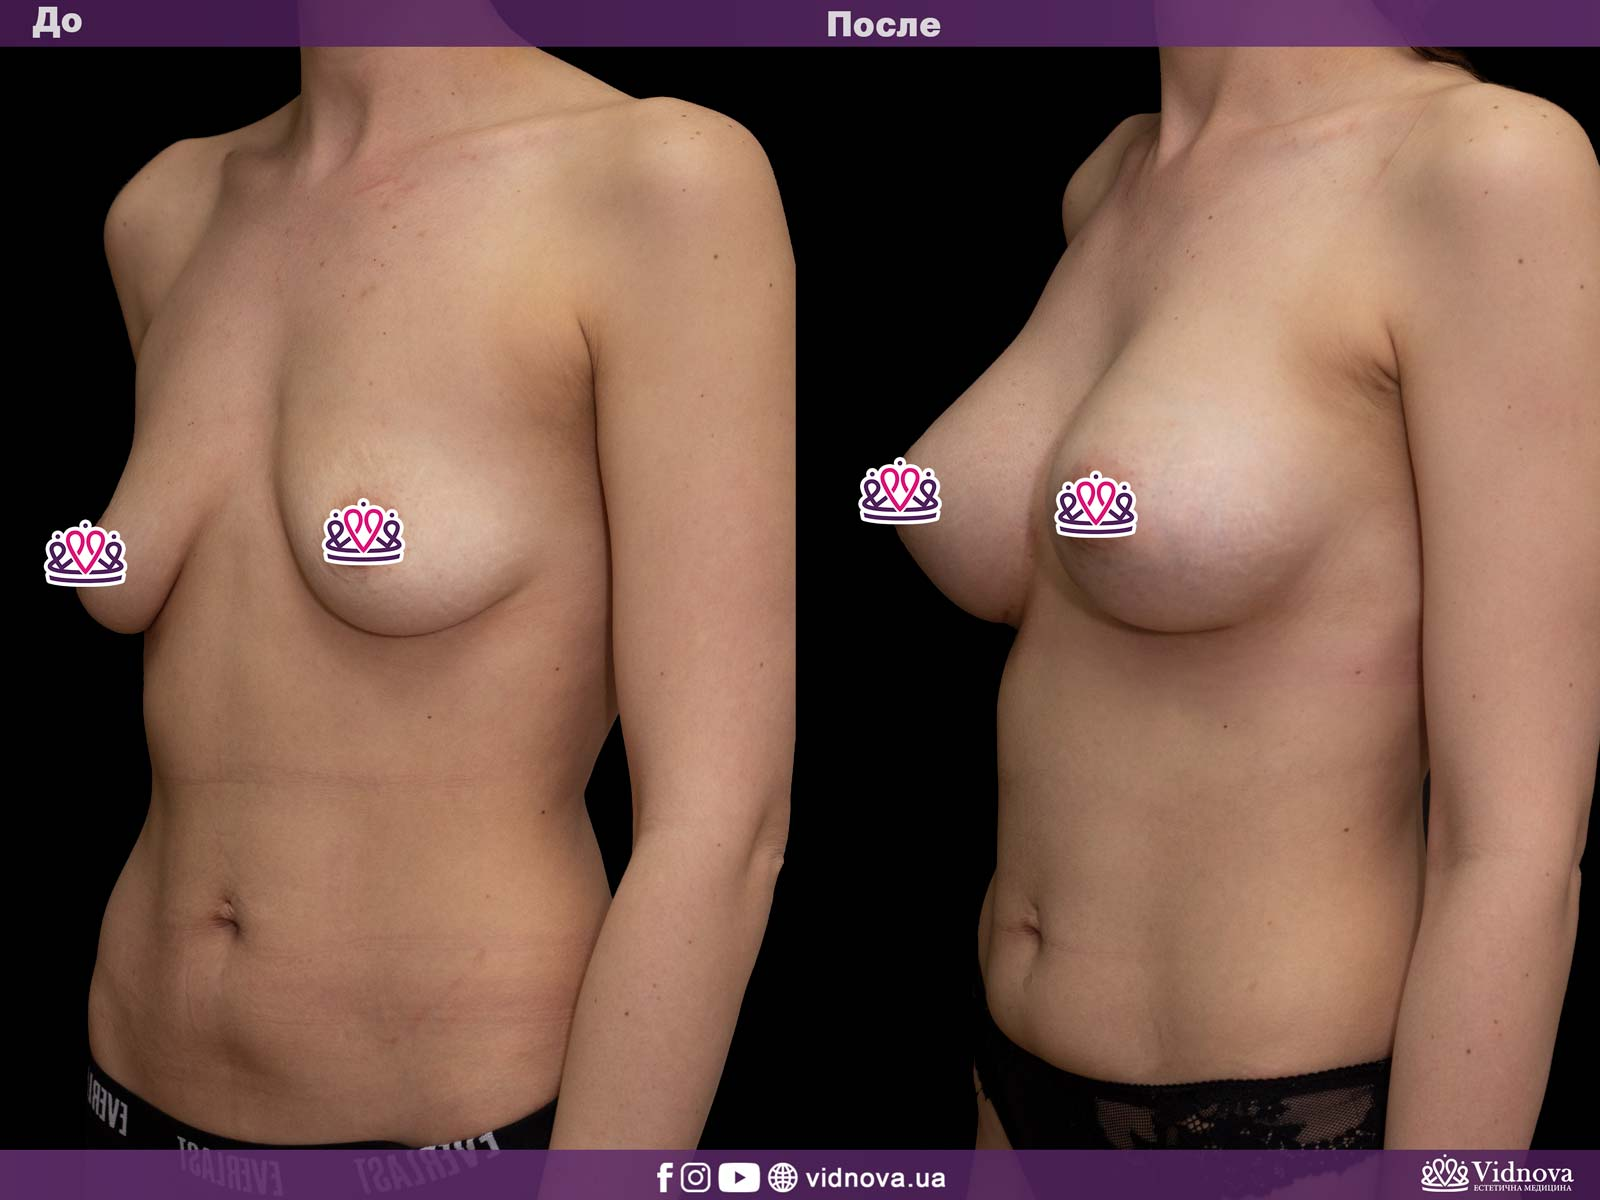 Увеличение груди: Фото ДО и ПОСЛЕ - Пример №18-2 - Клиника Vidnova